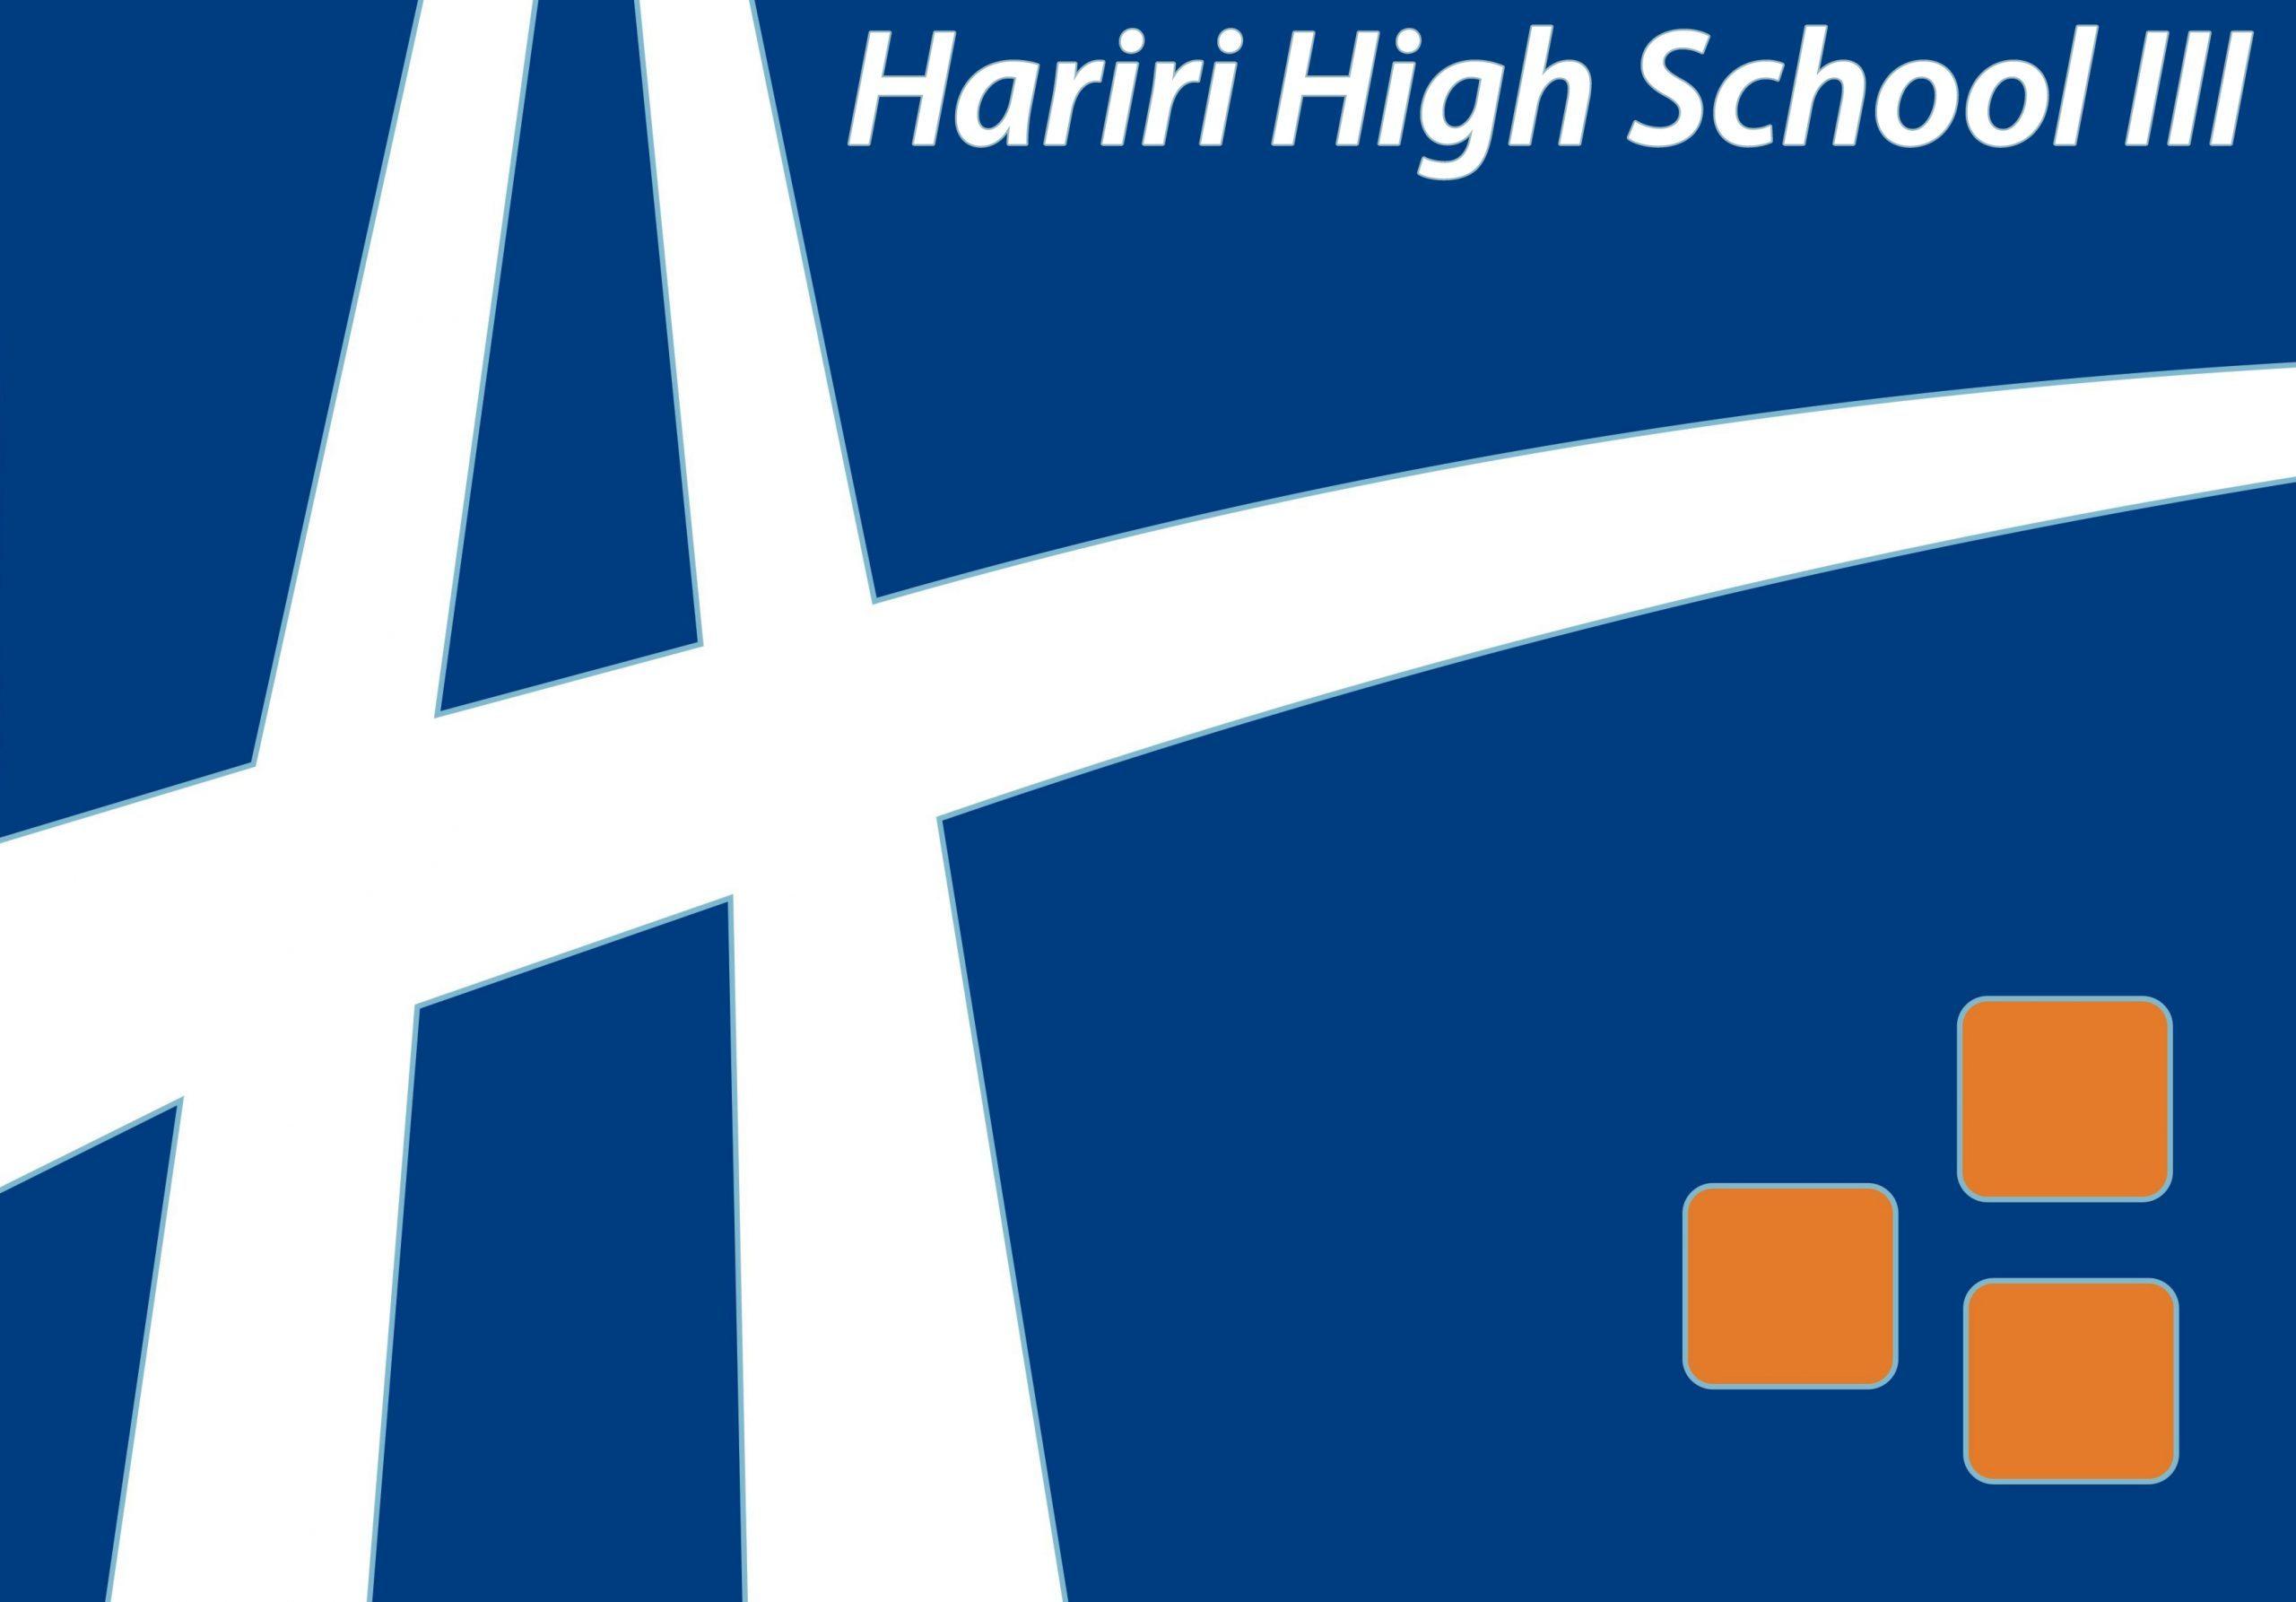 Hariri High School 3